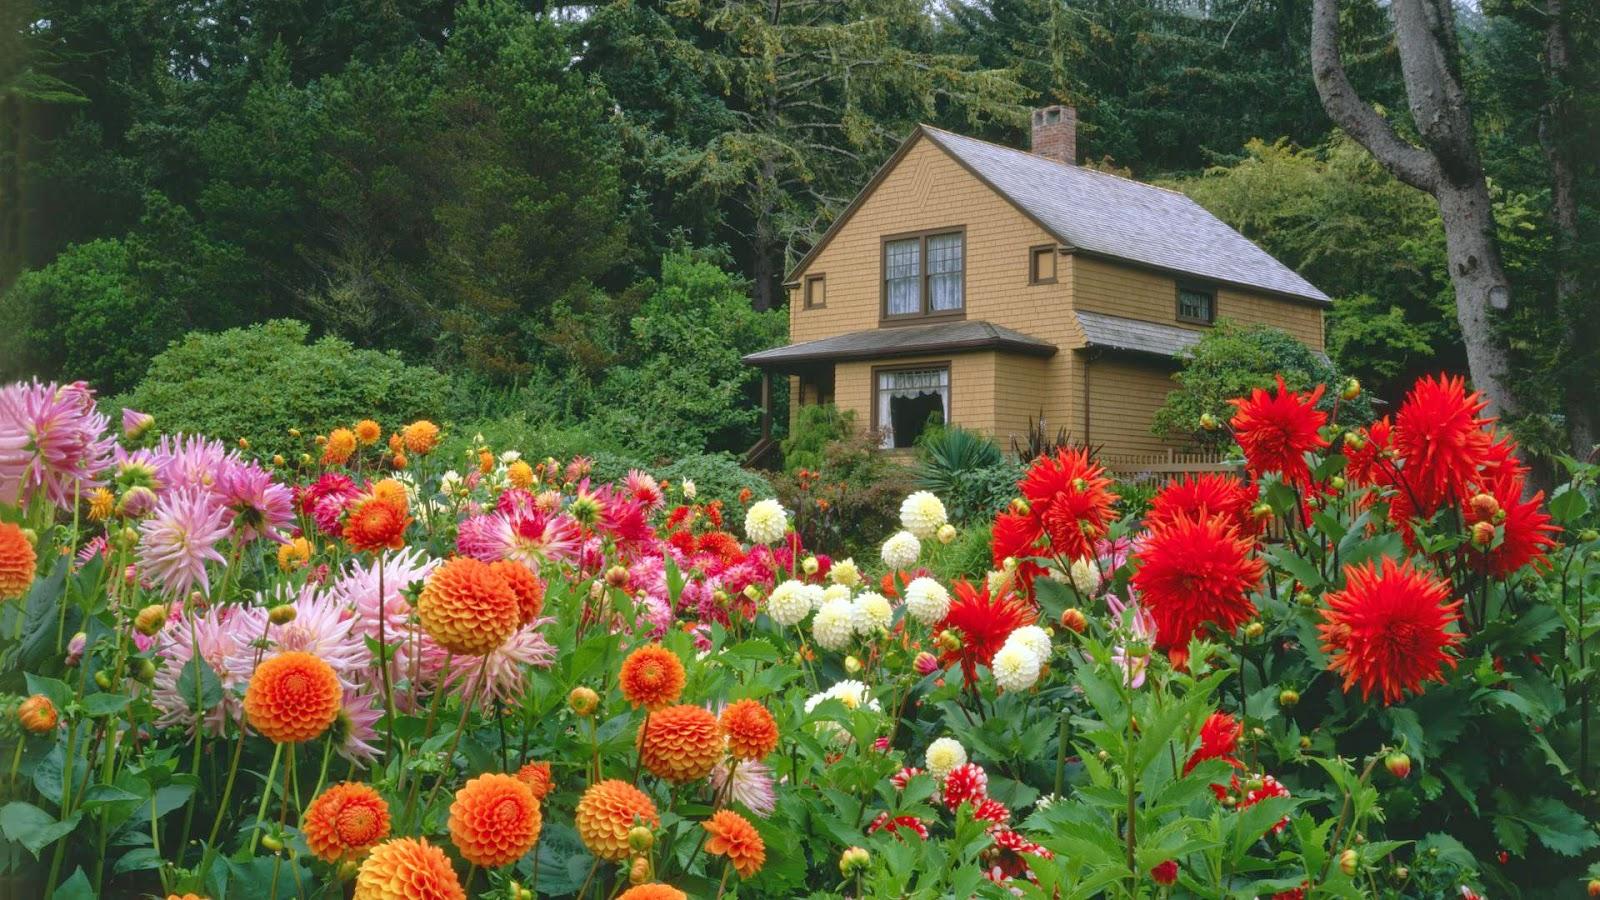 48 Hd Wallpaper Flower Gardens On Wallpapersafari